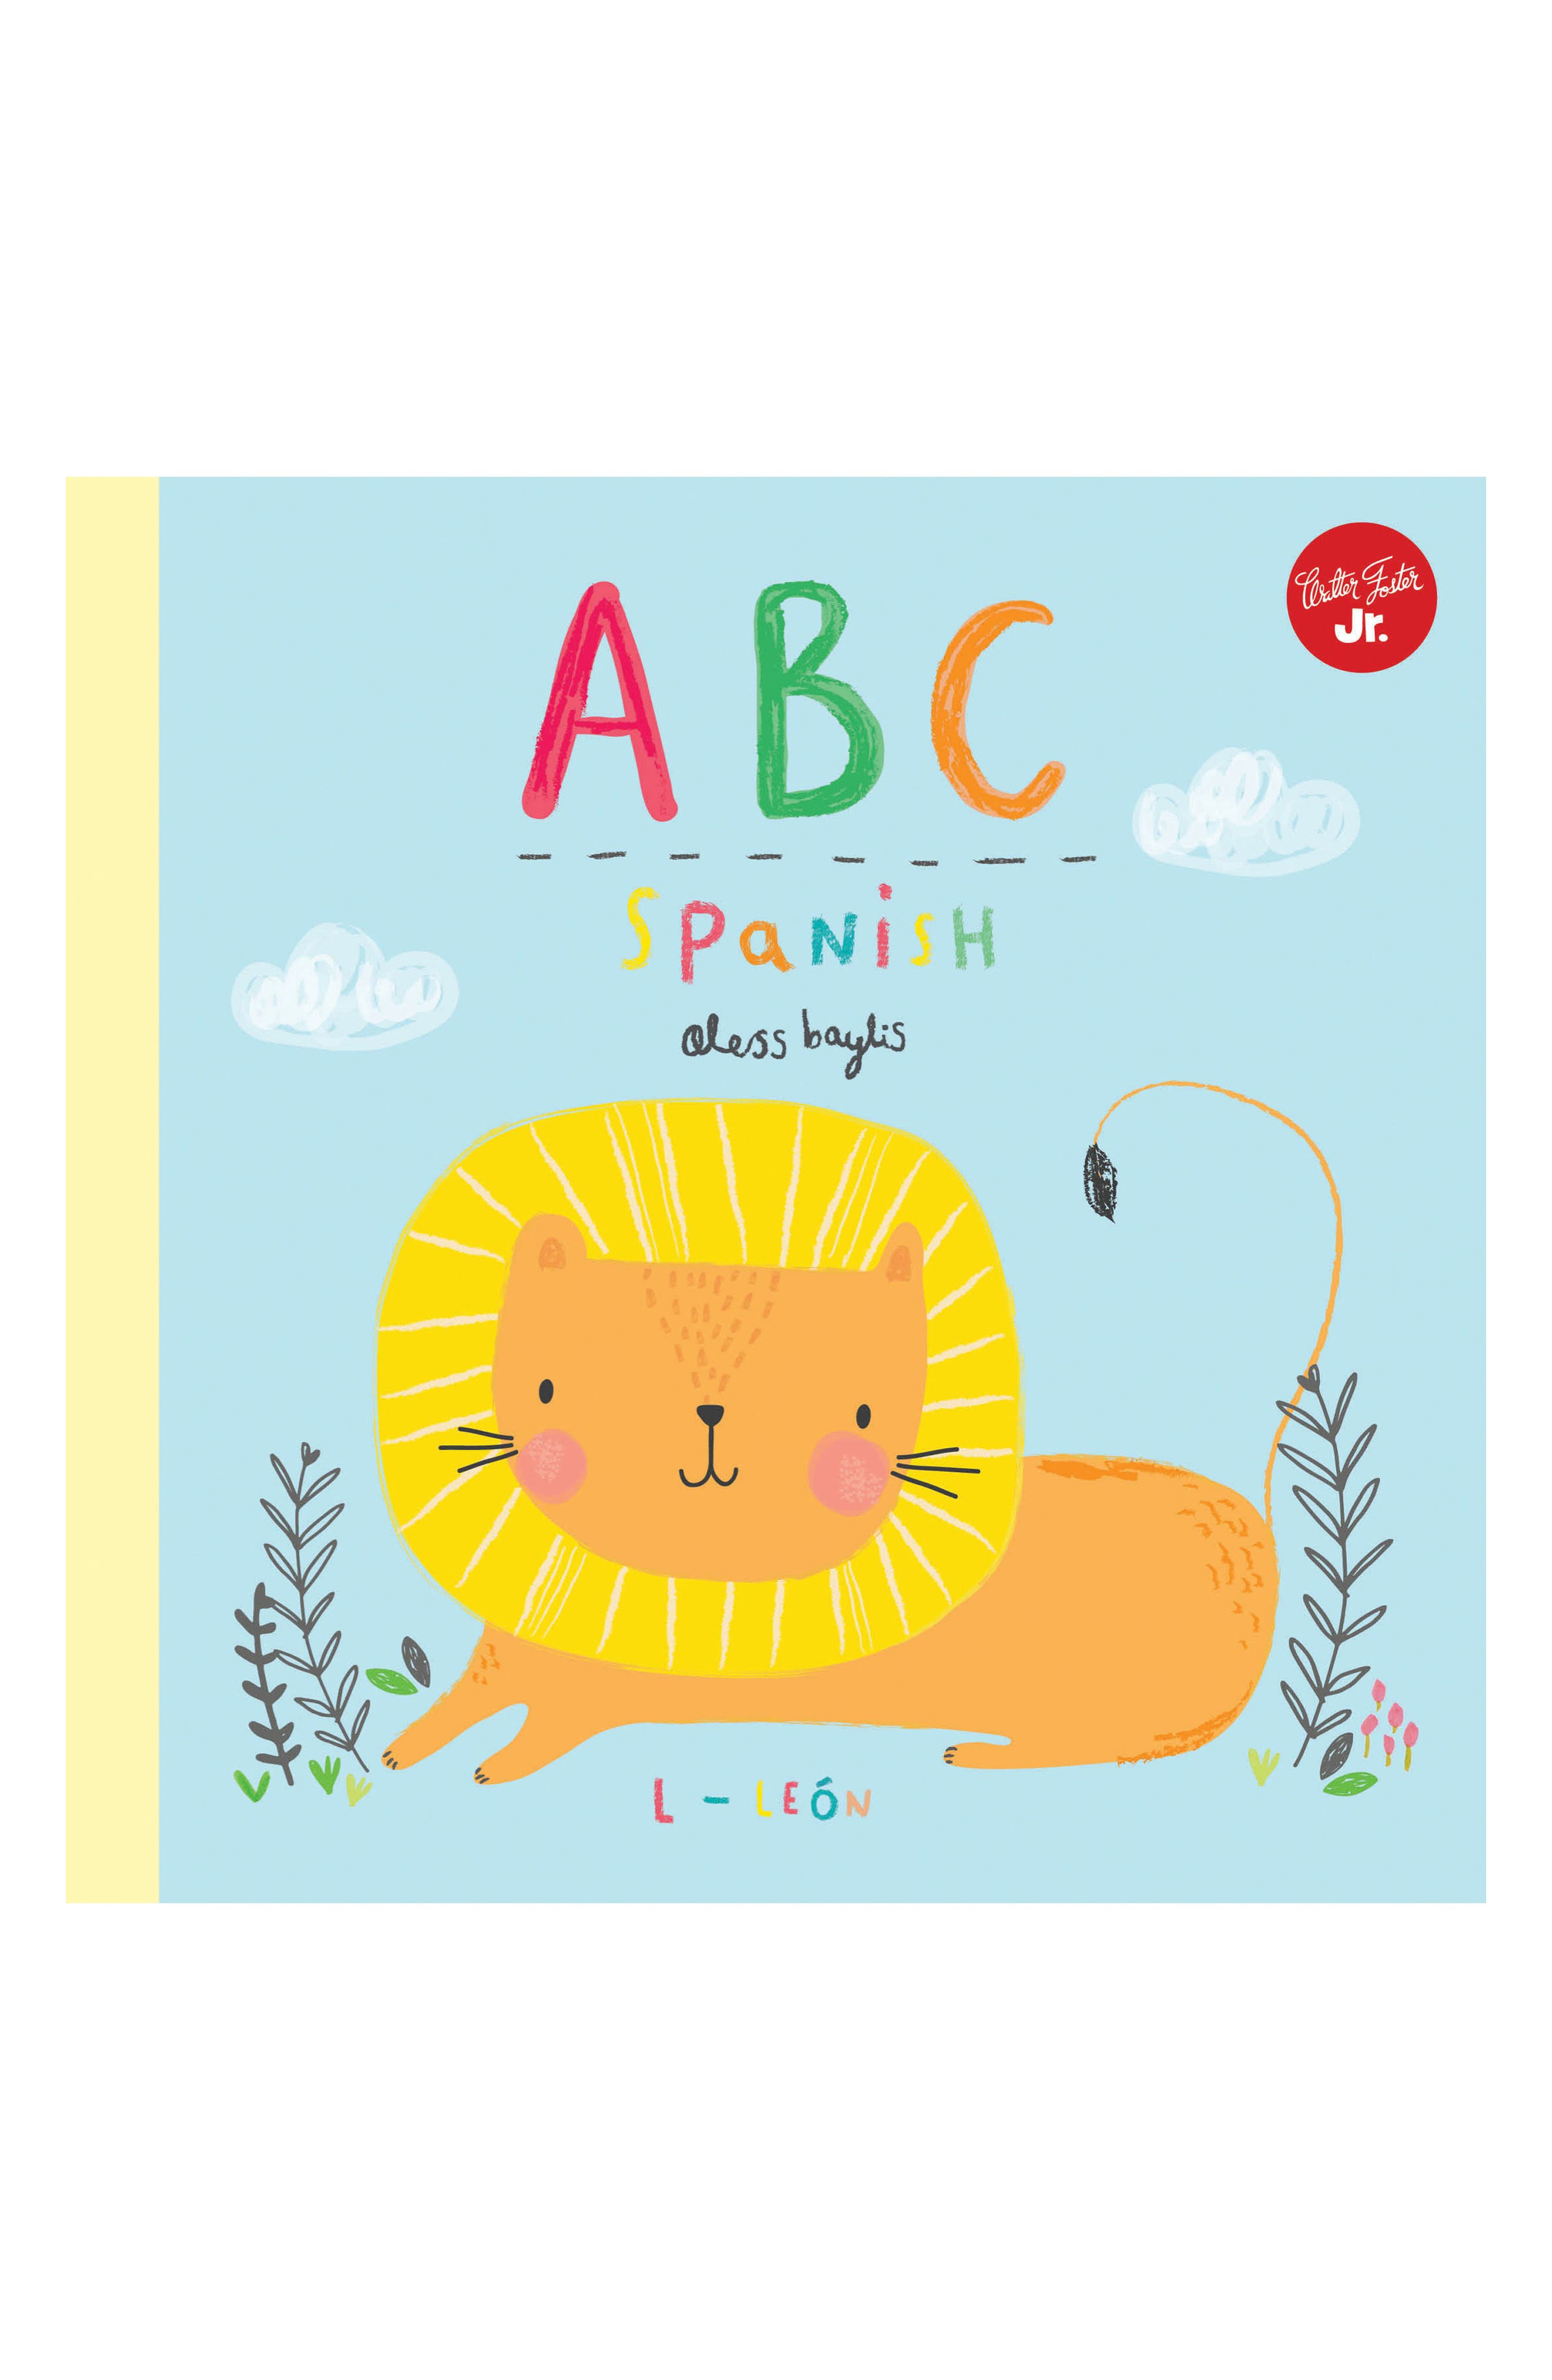 'ABC Spanish' Book,                             Main thumbnail 1, color,                             Multi